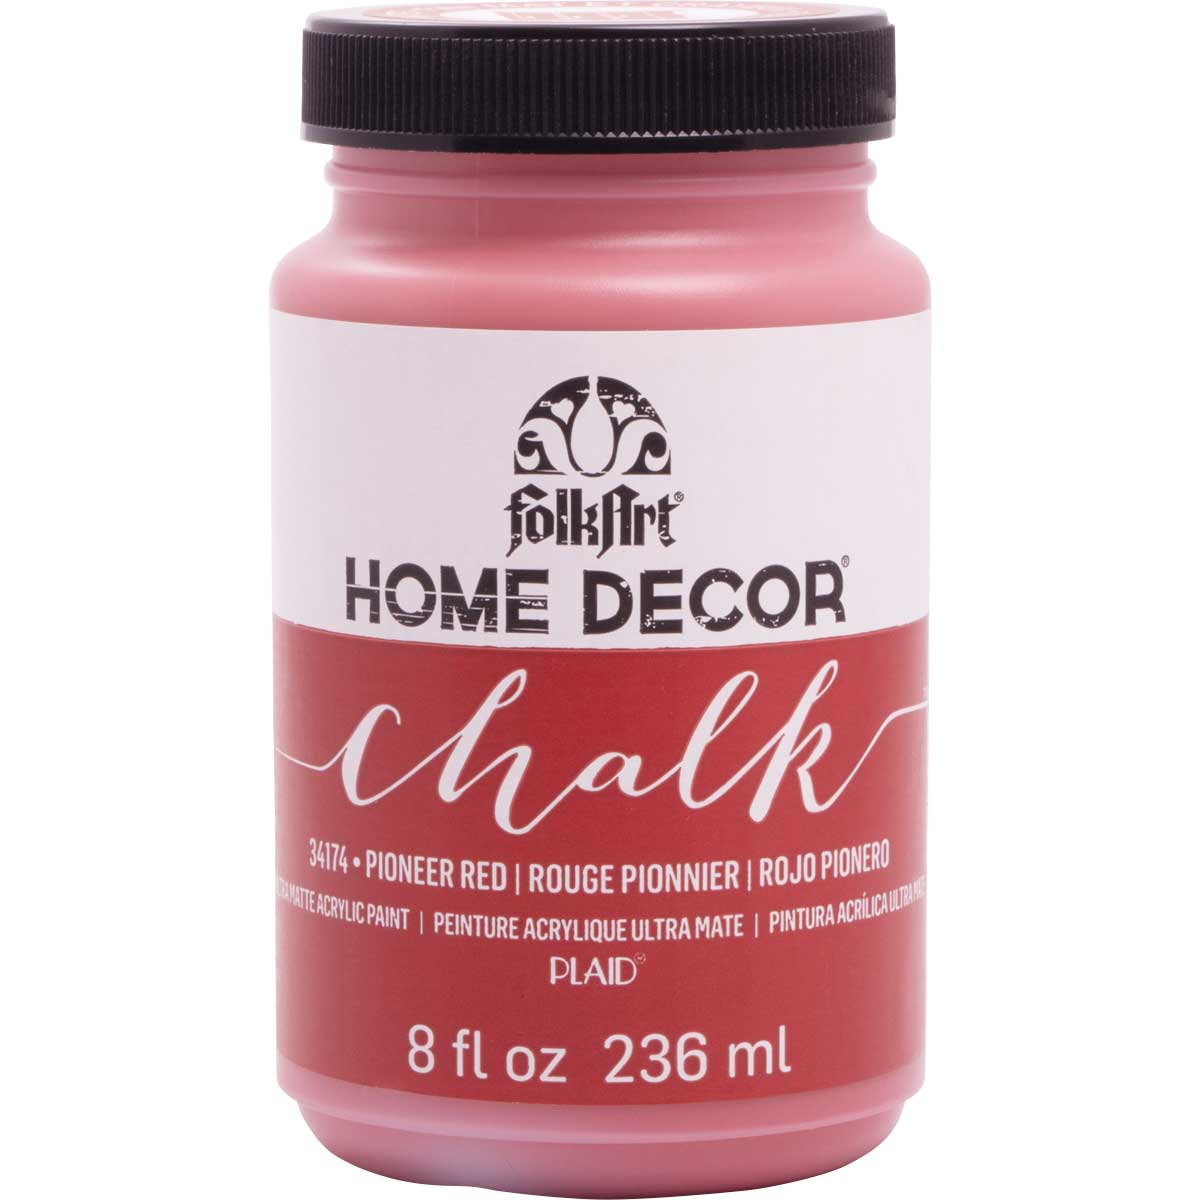 FolkArt ® Home Decor™  Chalk - Pioneer Red, 8 oz.